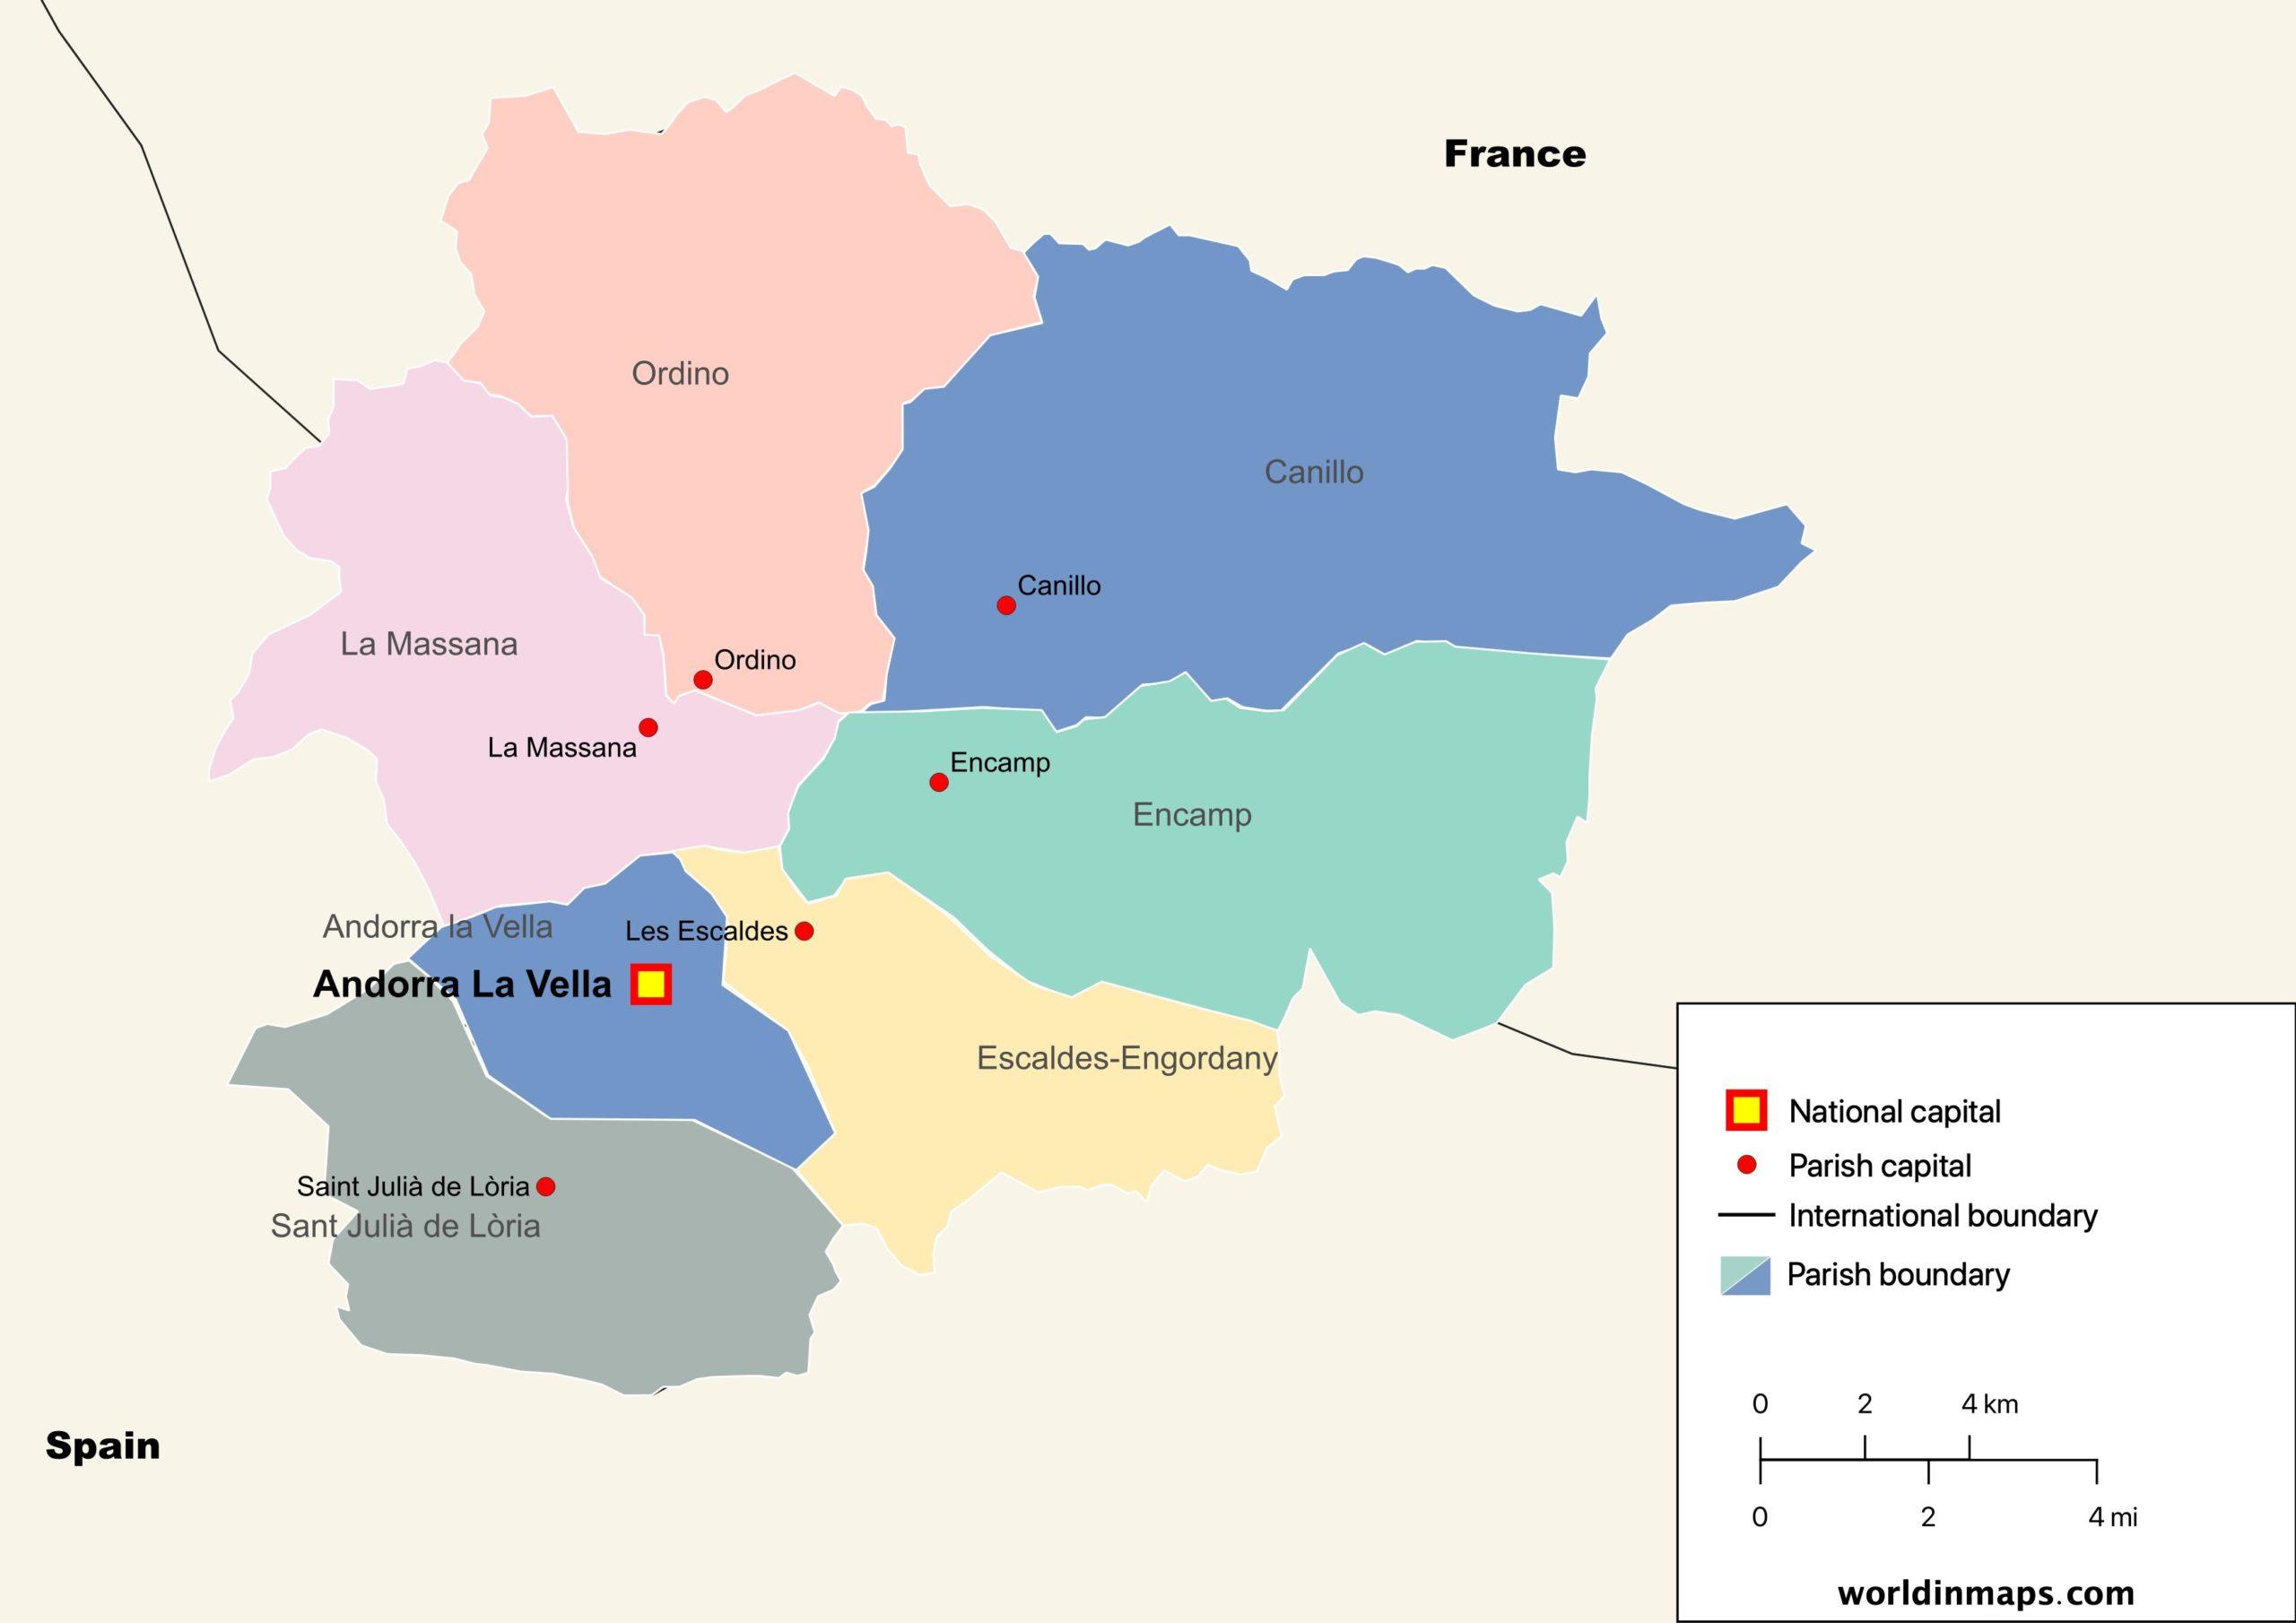 political map of Albania with parish boundaries and parish capitals